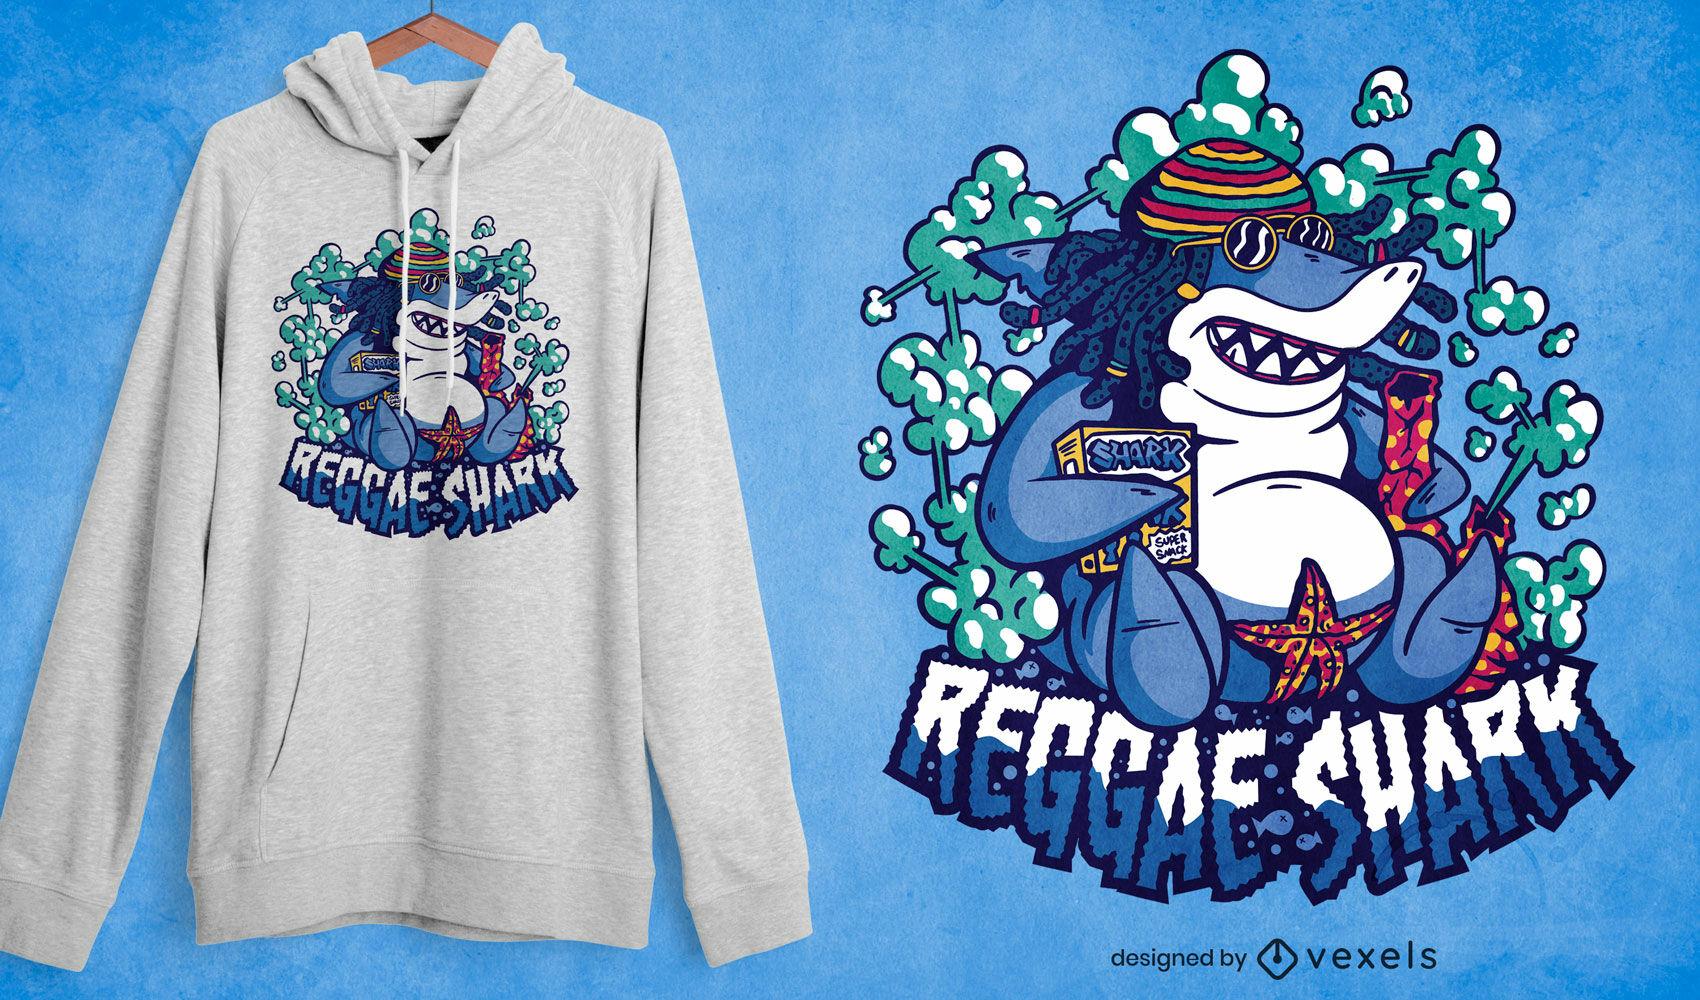 Dise?o de camiseta de dibujos animados de tibur?n reggae.